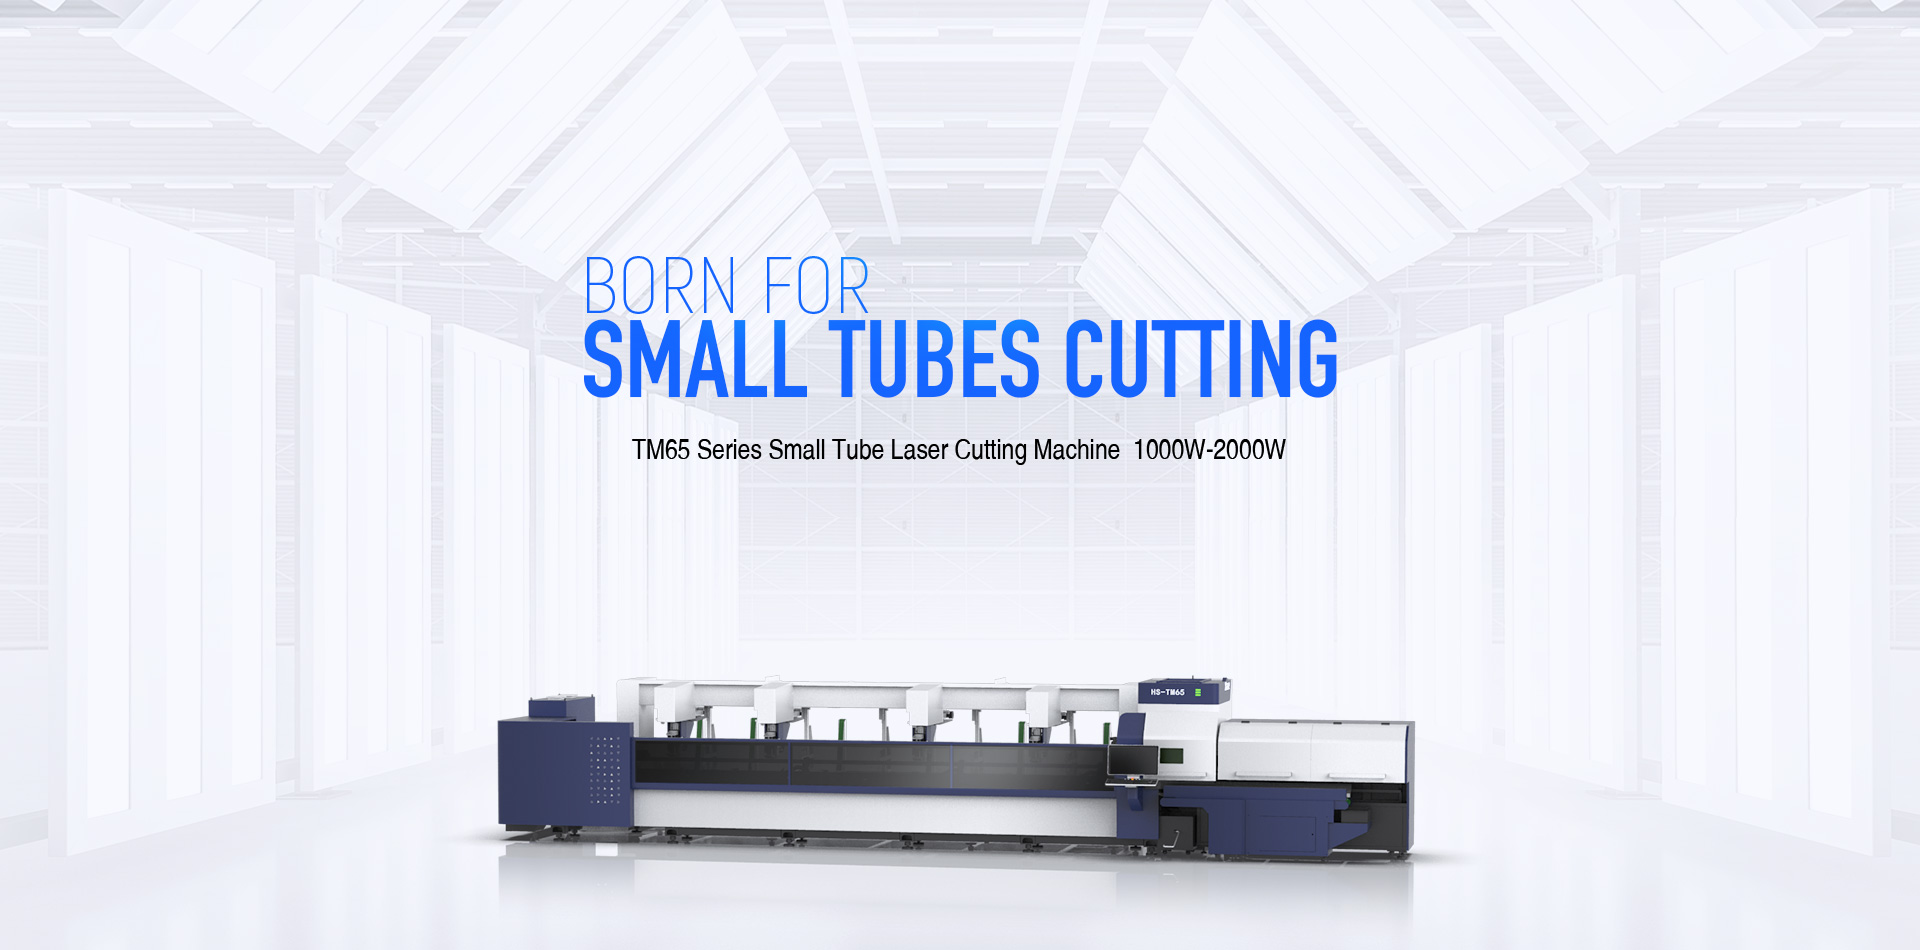 TM65 Series Tiny Tube Laser Cutting Machine